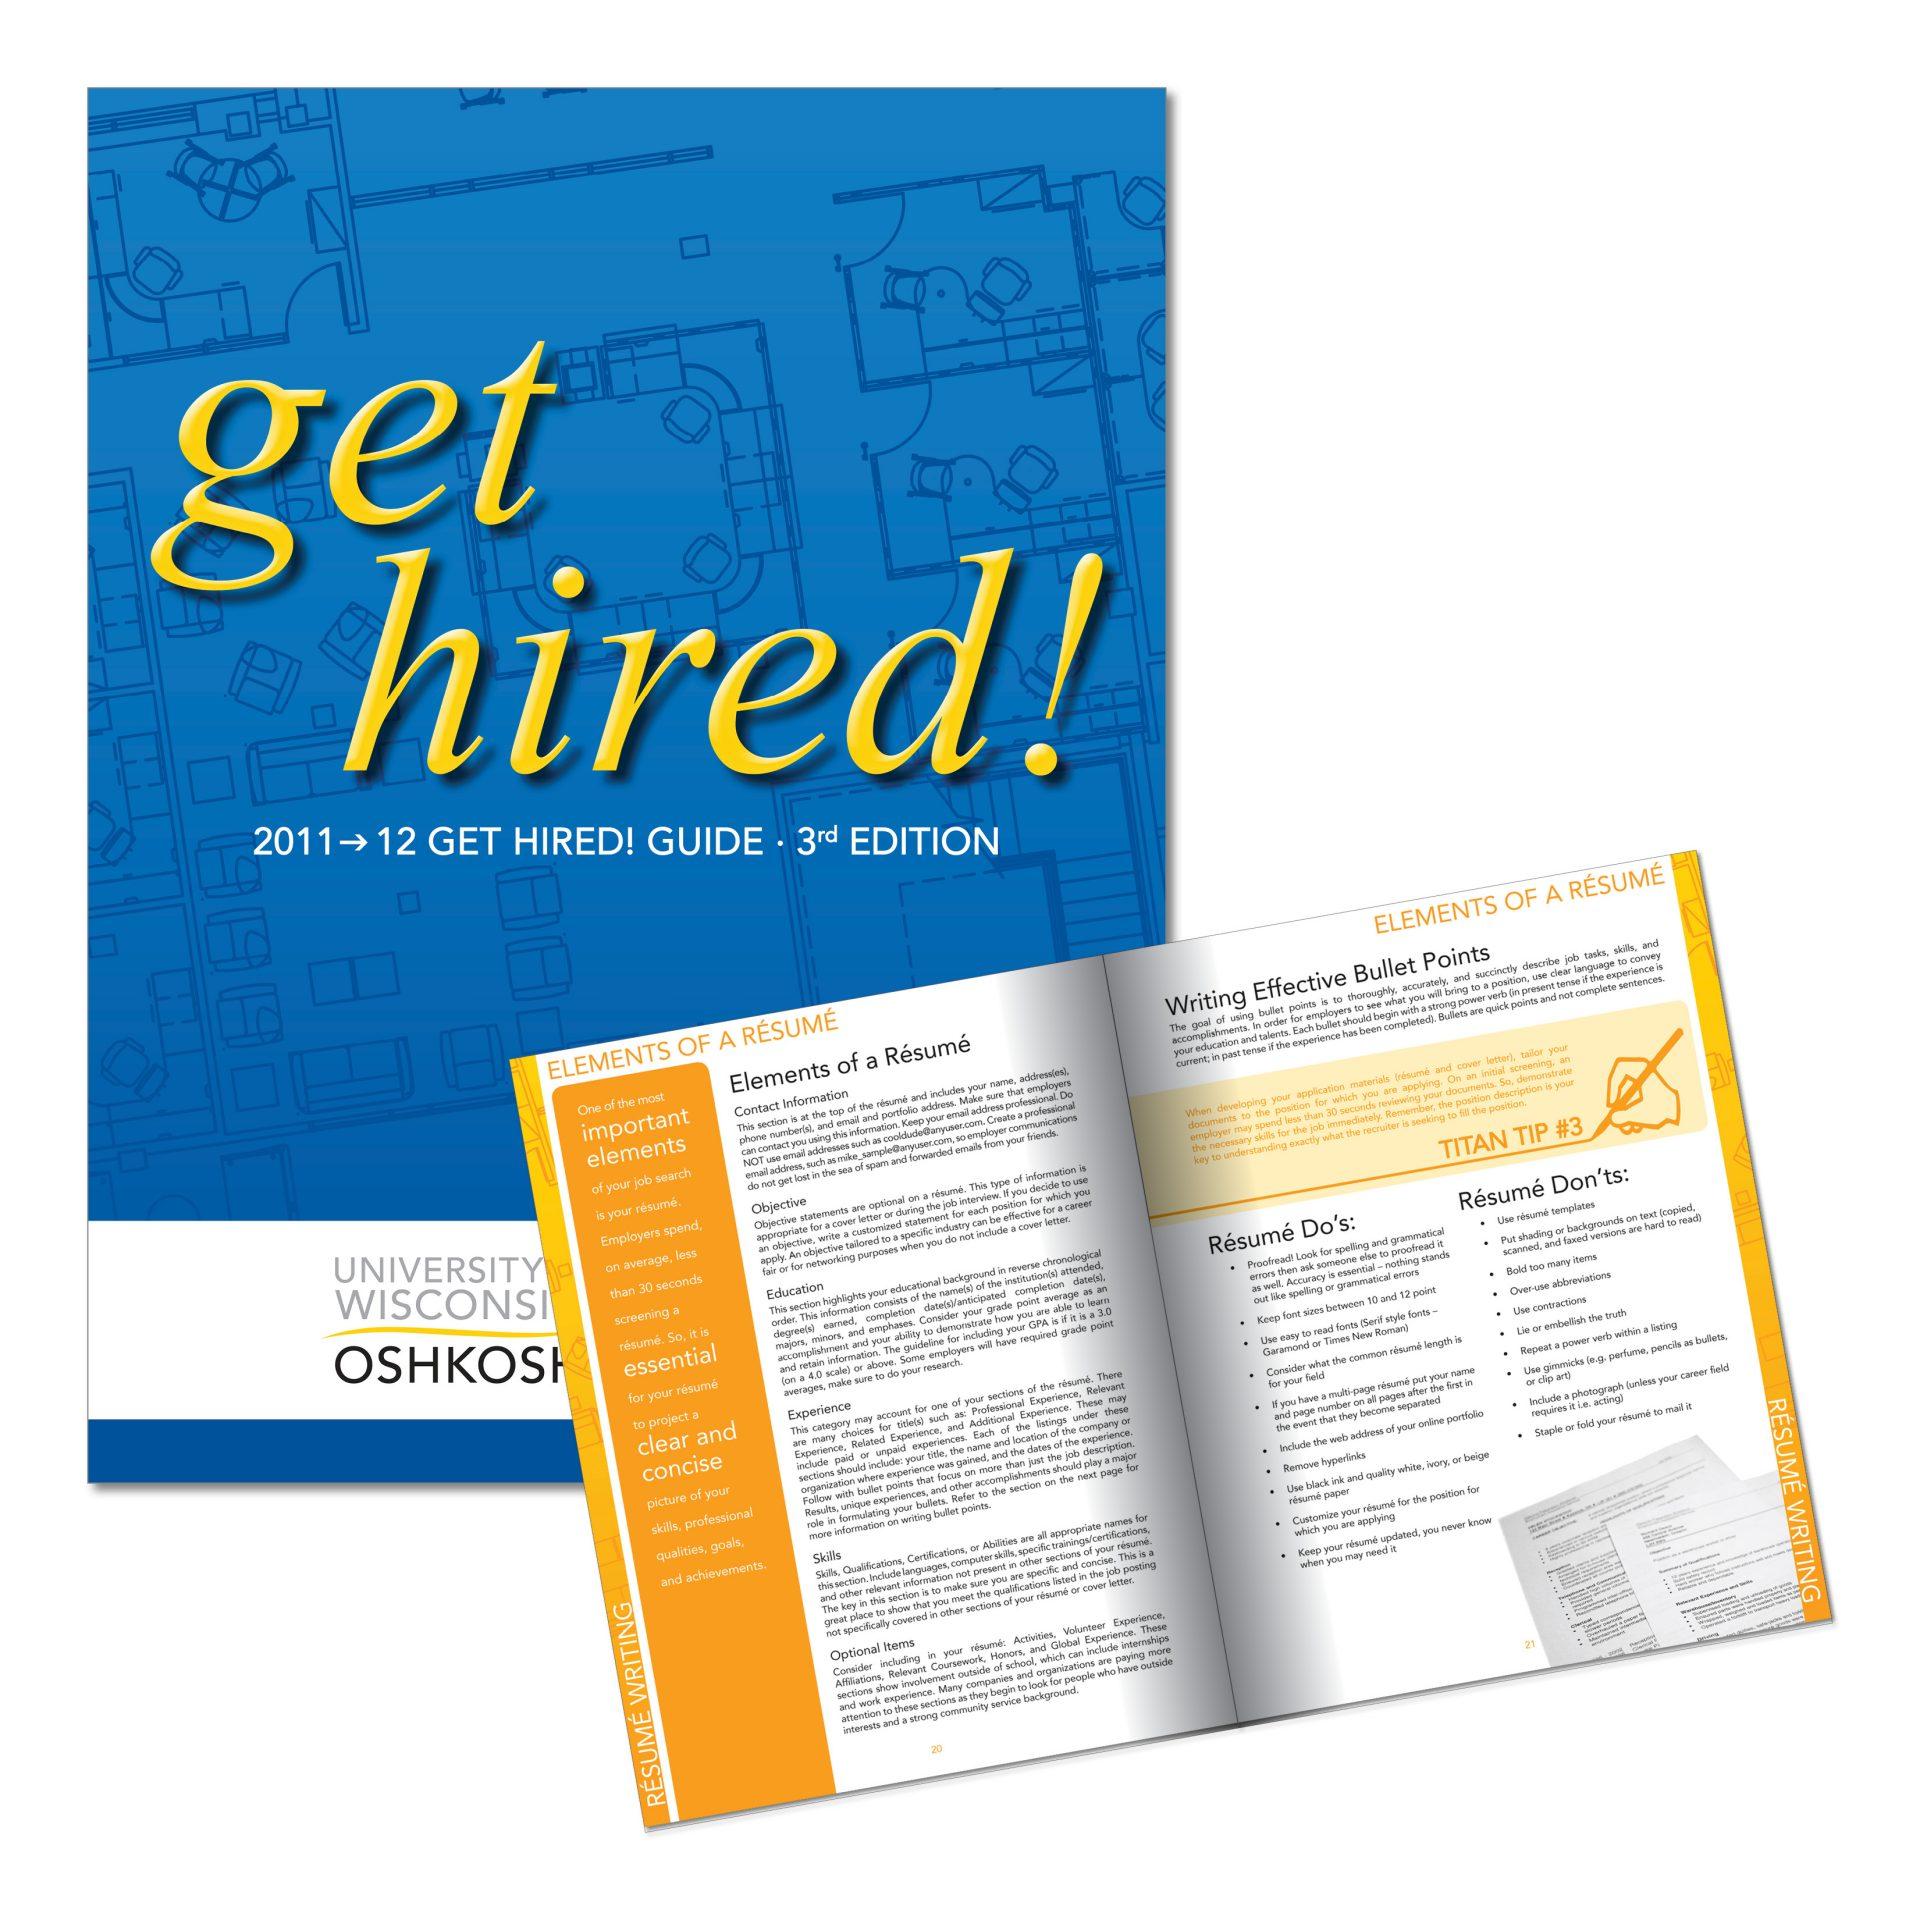 2011 | UW Oshkosh Career Services | 80 page textbook